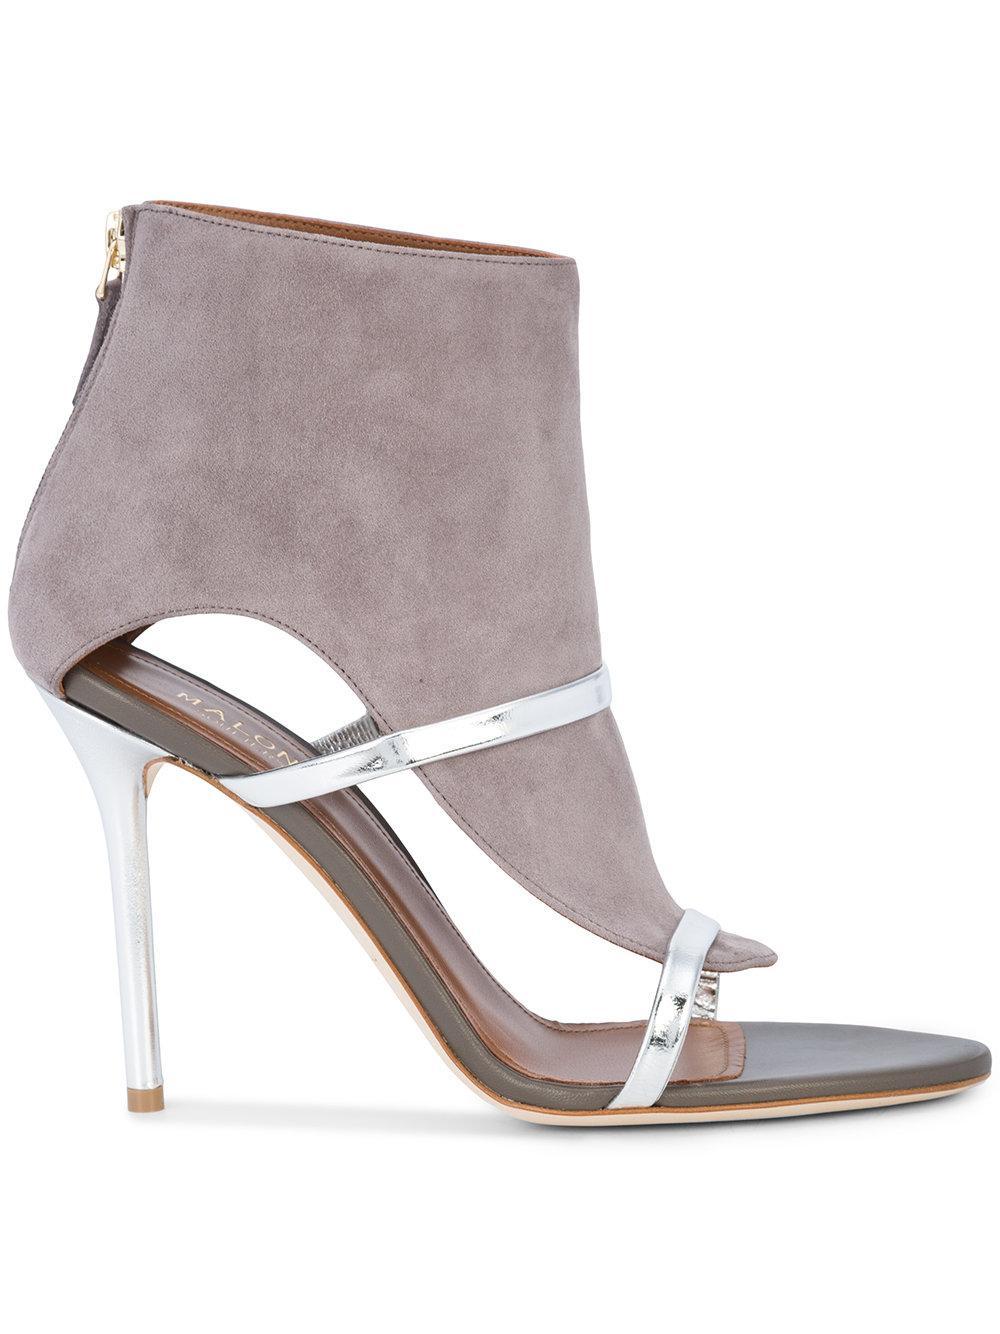 Nappa Suede High Heel Sandal Bootie Item # MILEY6